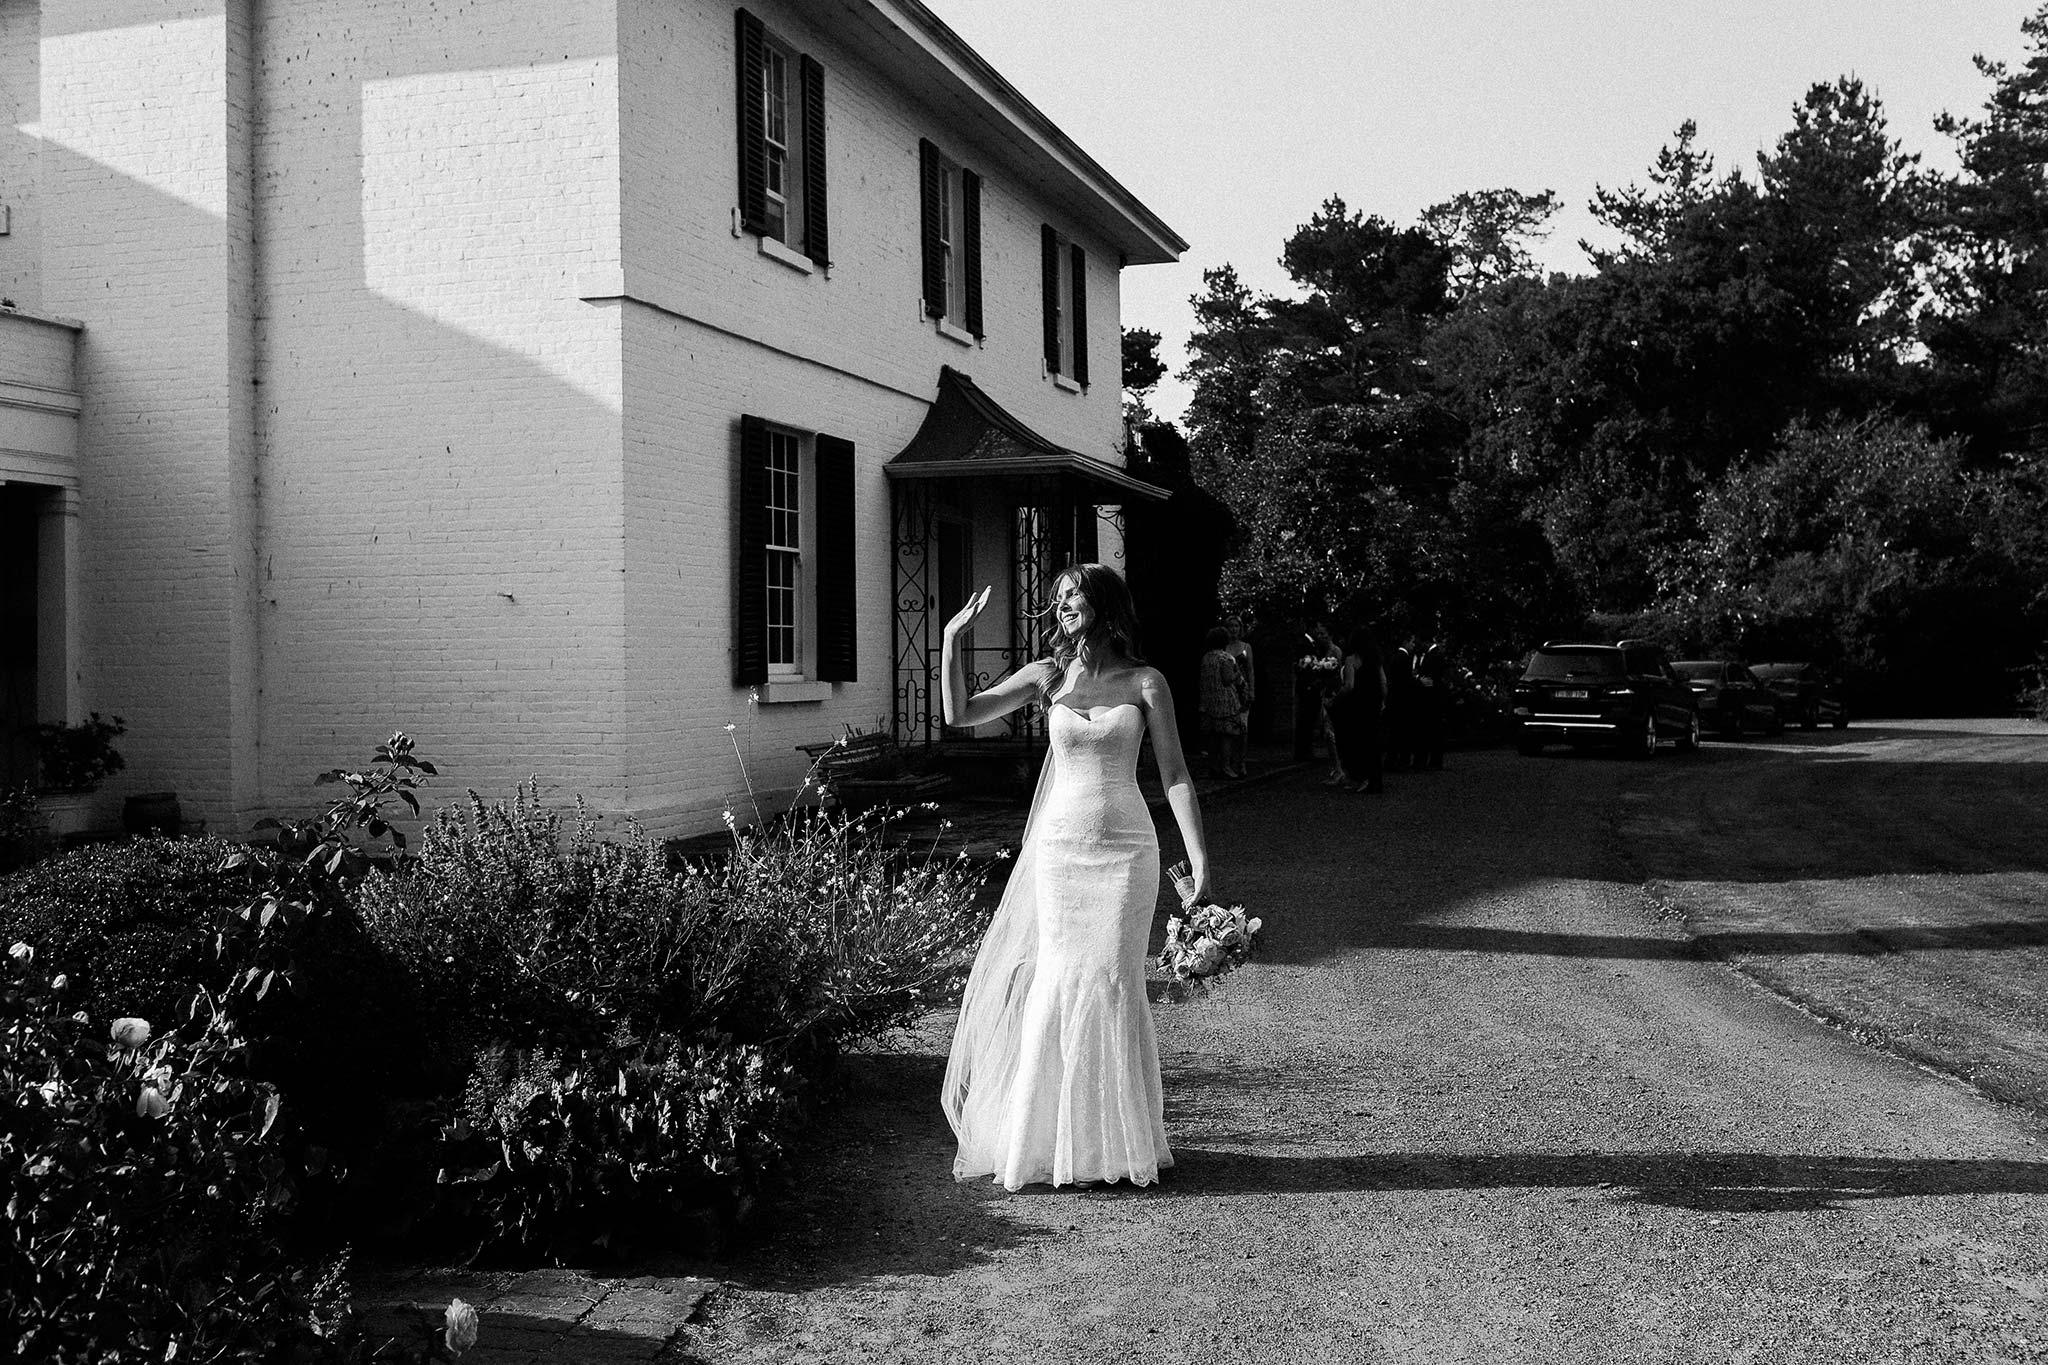 Launceston-Brickendon-Wedding-Photographer-bride-leaving